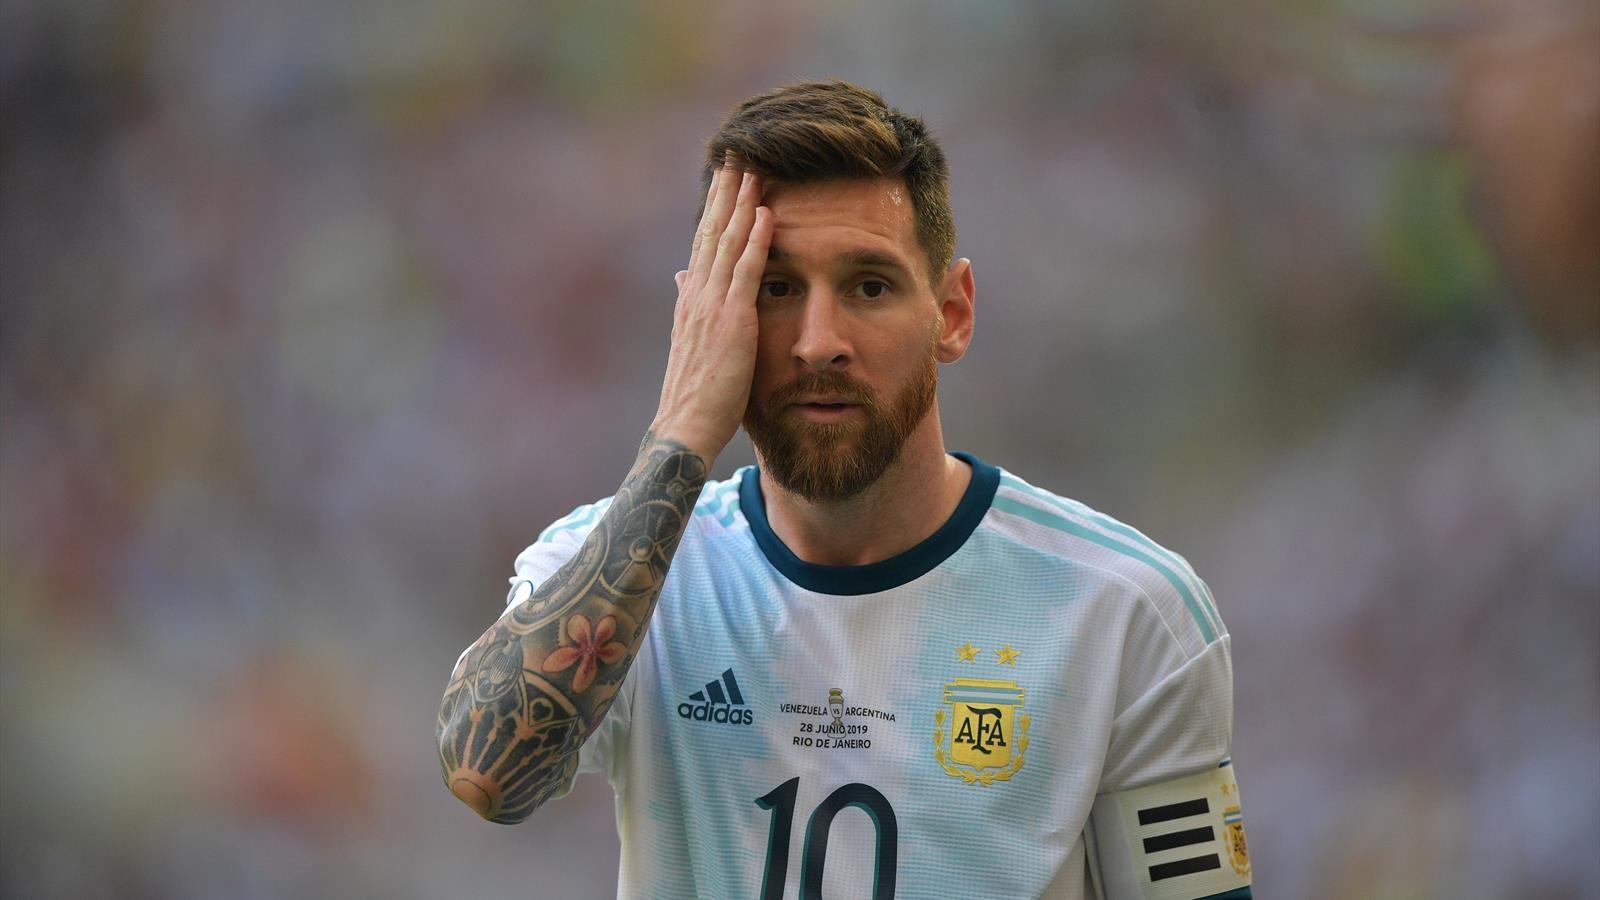 lieonel messi argentina kubok ameriki 2020